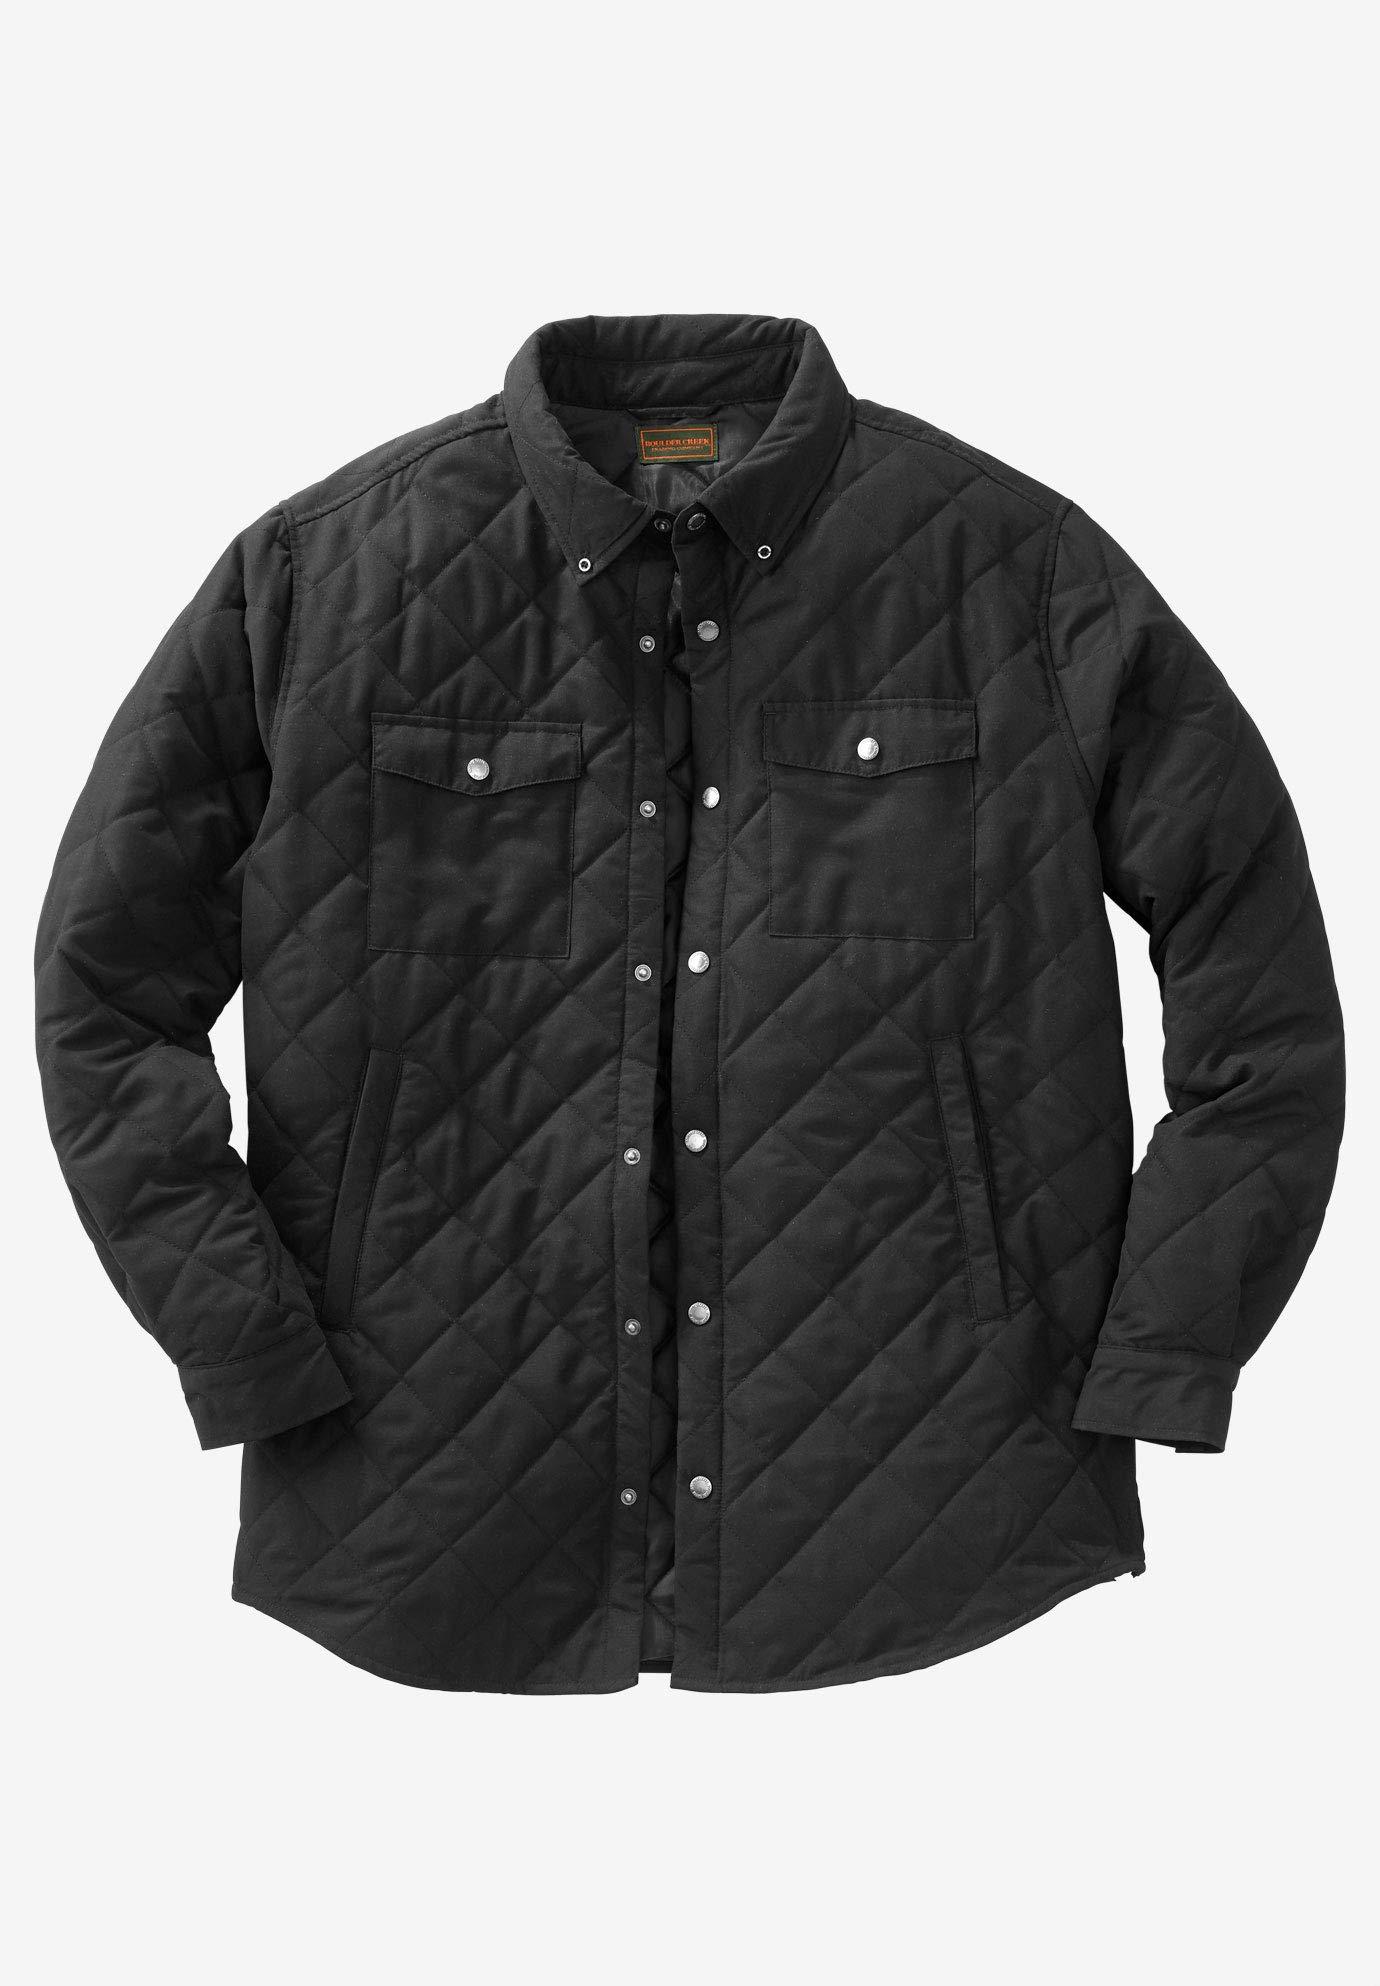 Boulder Creek by Kingsize Men's Big & Tall Quilted Shirt Jacket